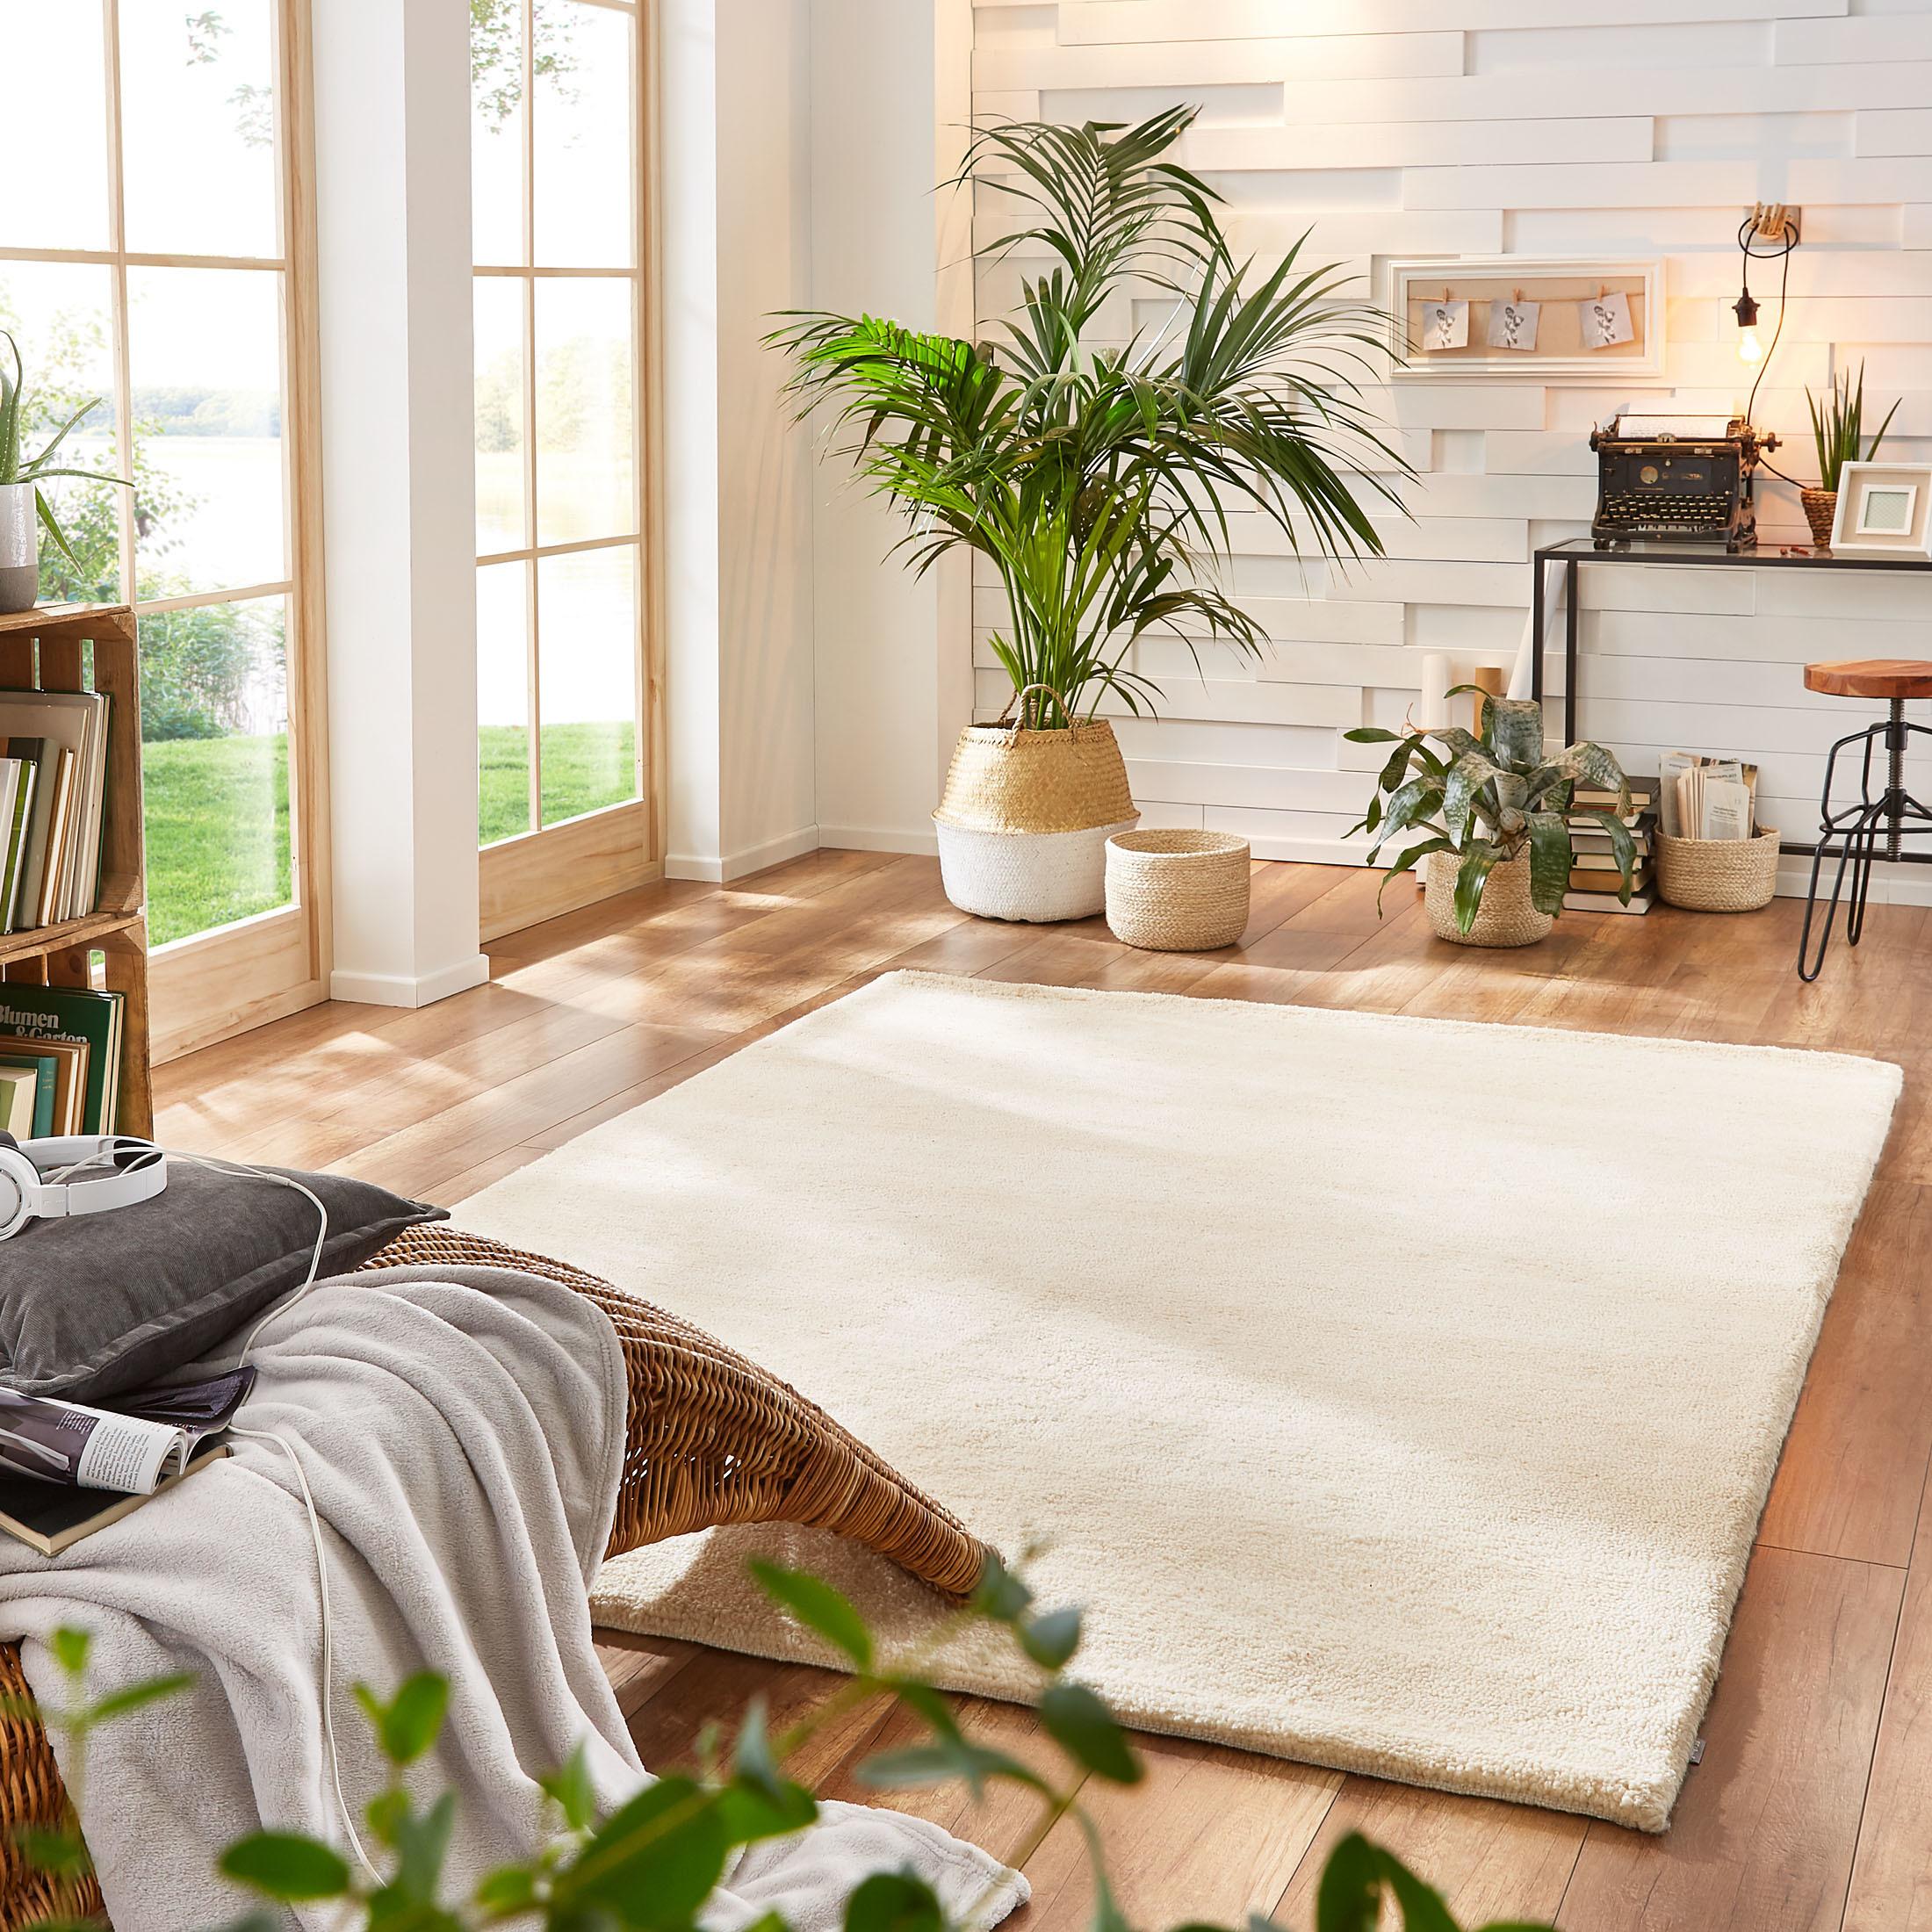 woll teppich von kibek tanger in creme 60 x 90 cm. Black Bedroom Furniture Sets. Home Design Ideas